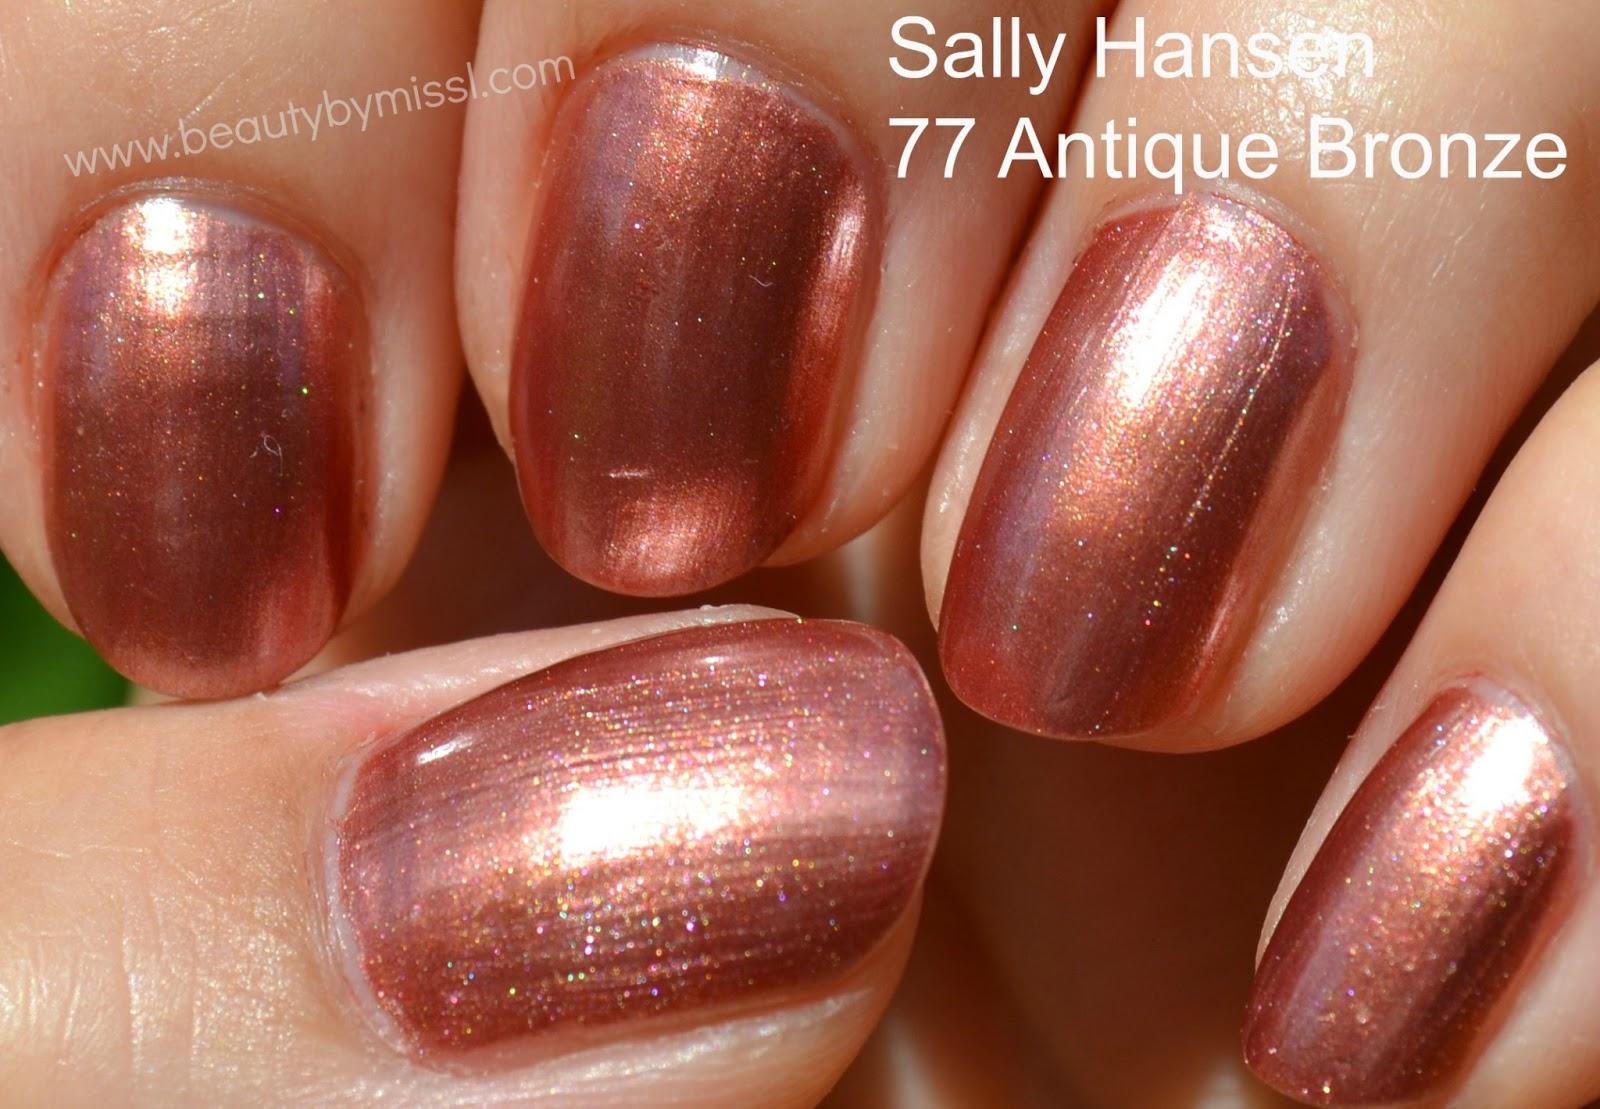 sally hansen diamond strength 77 antique bronze